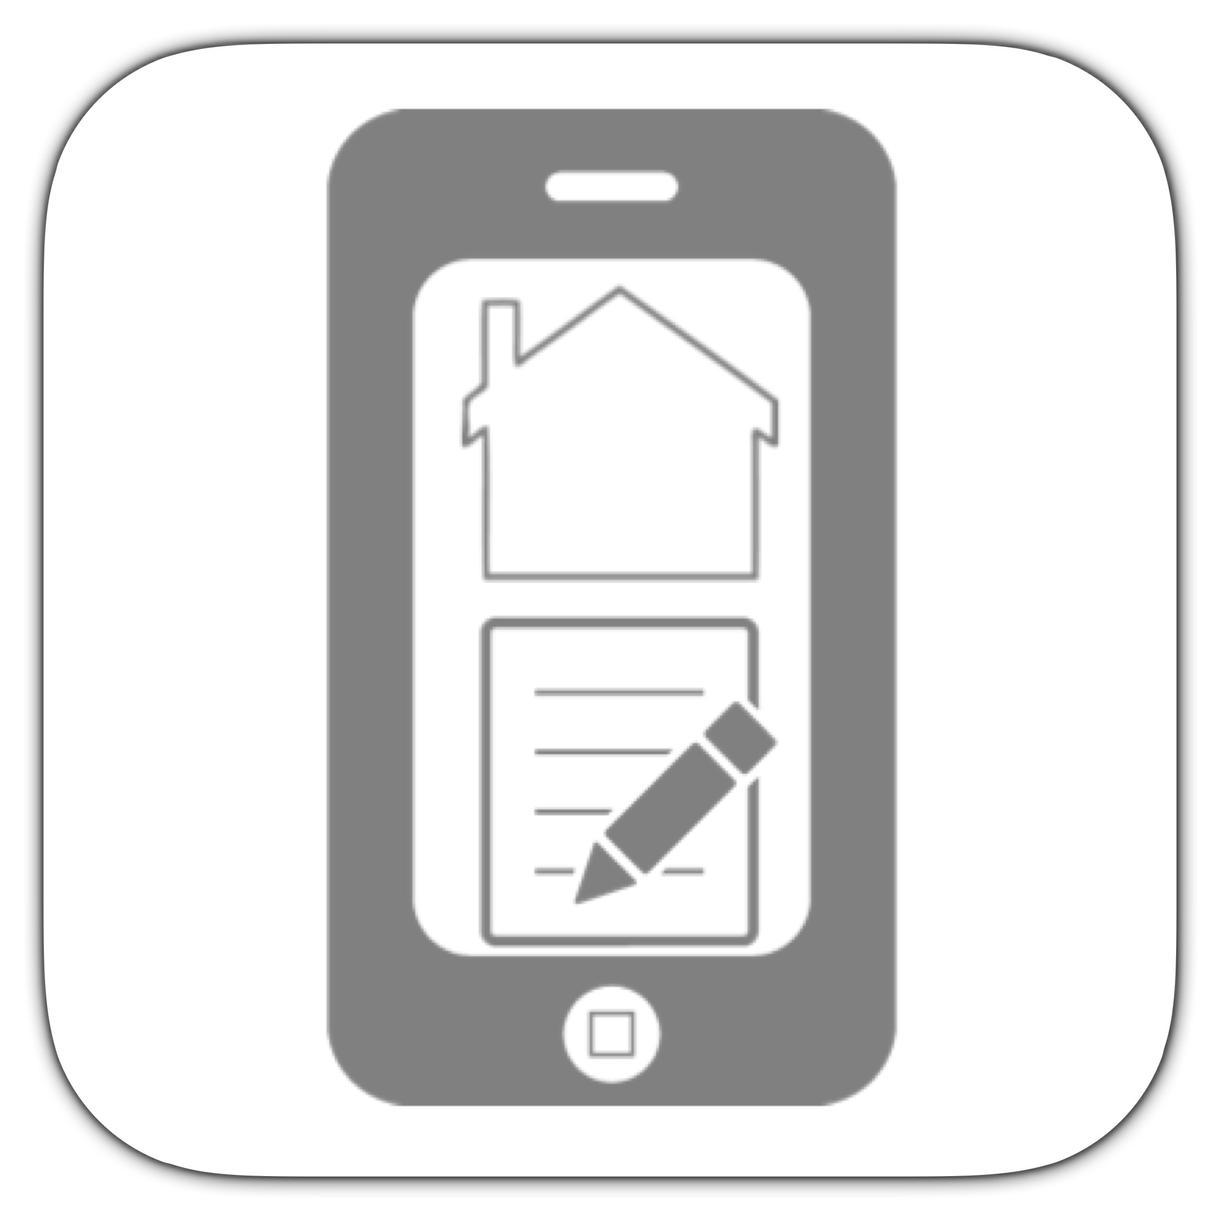 iPhoneだけでHPを作成する方法をお教えします パソコンが無くても無料でホームページが作れます。